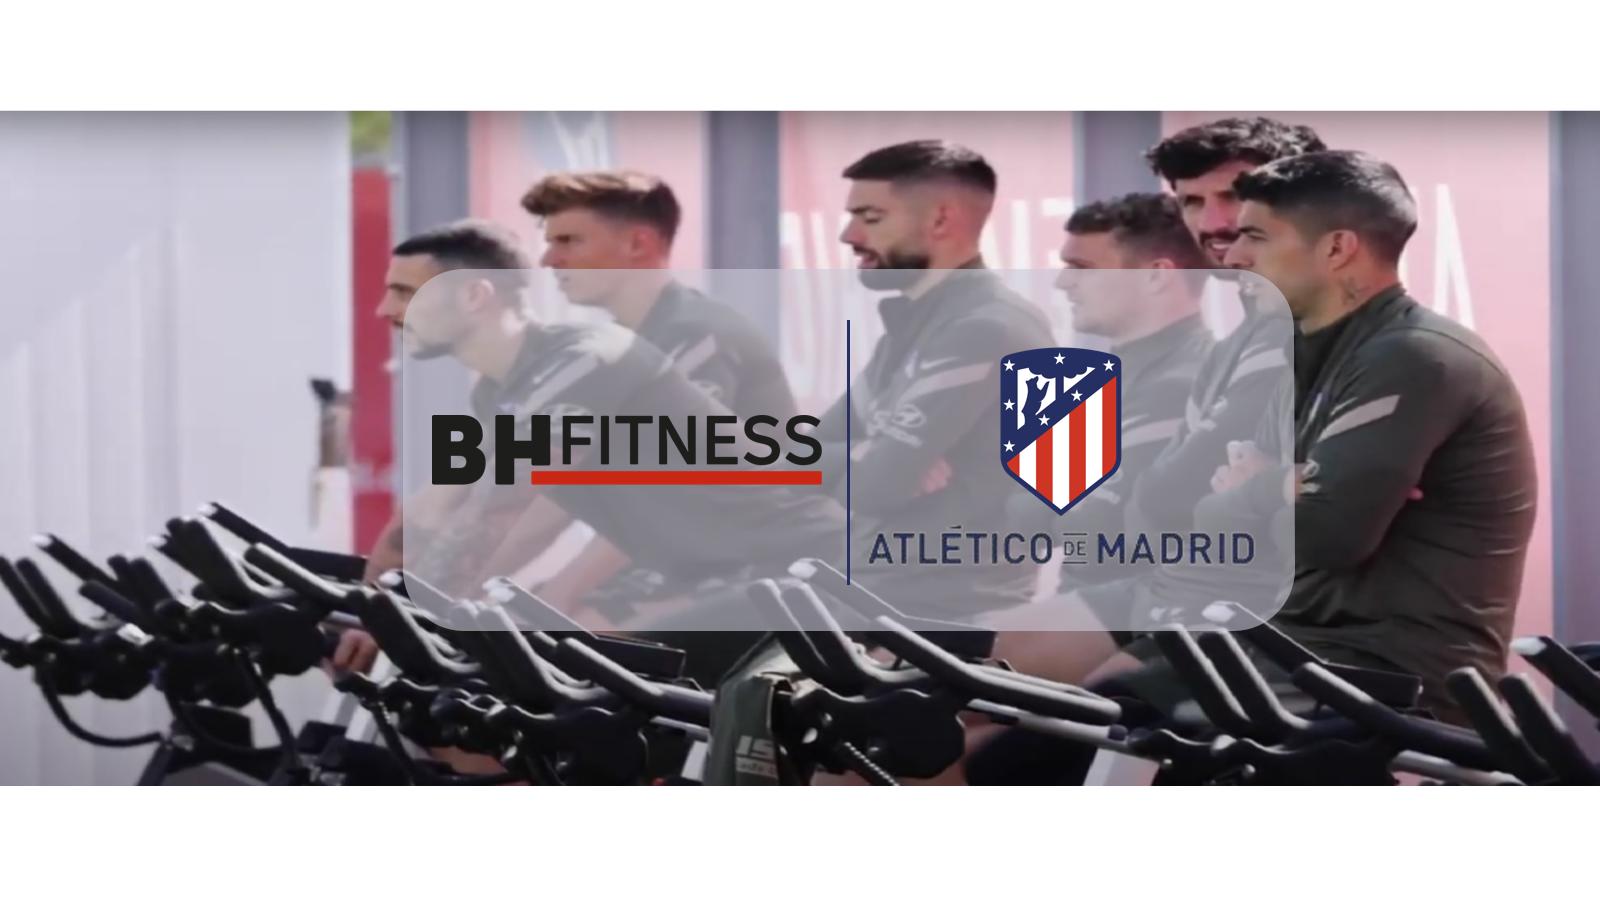 BH Fitness-Atletico de Madrid